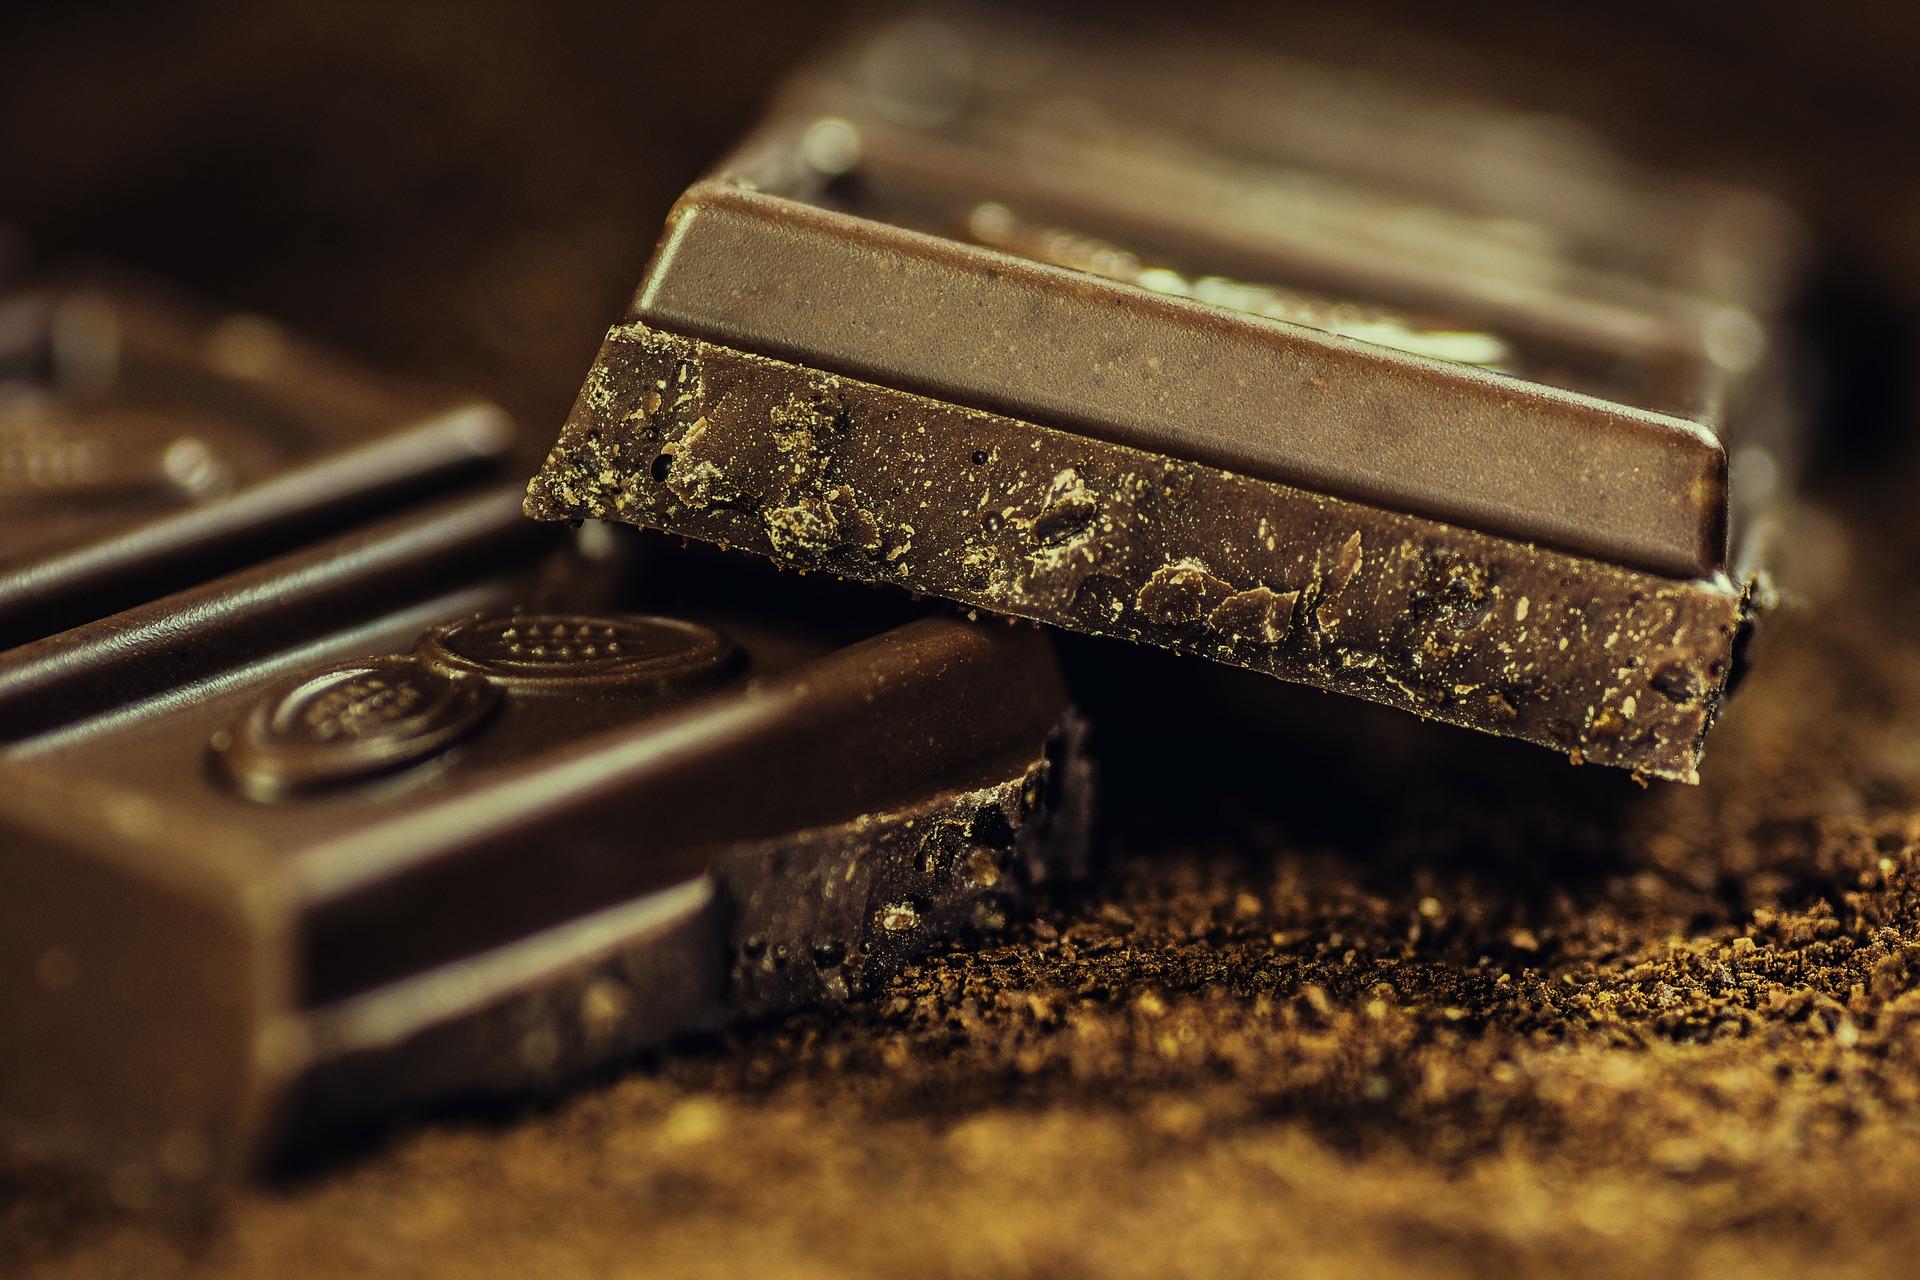 4964-cokolada.jpg